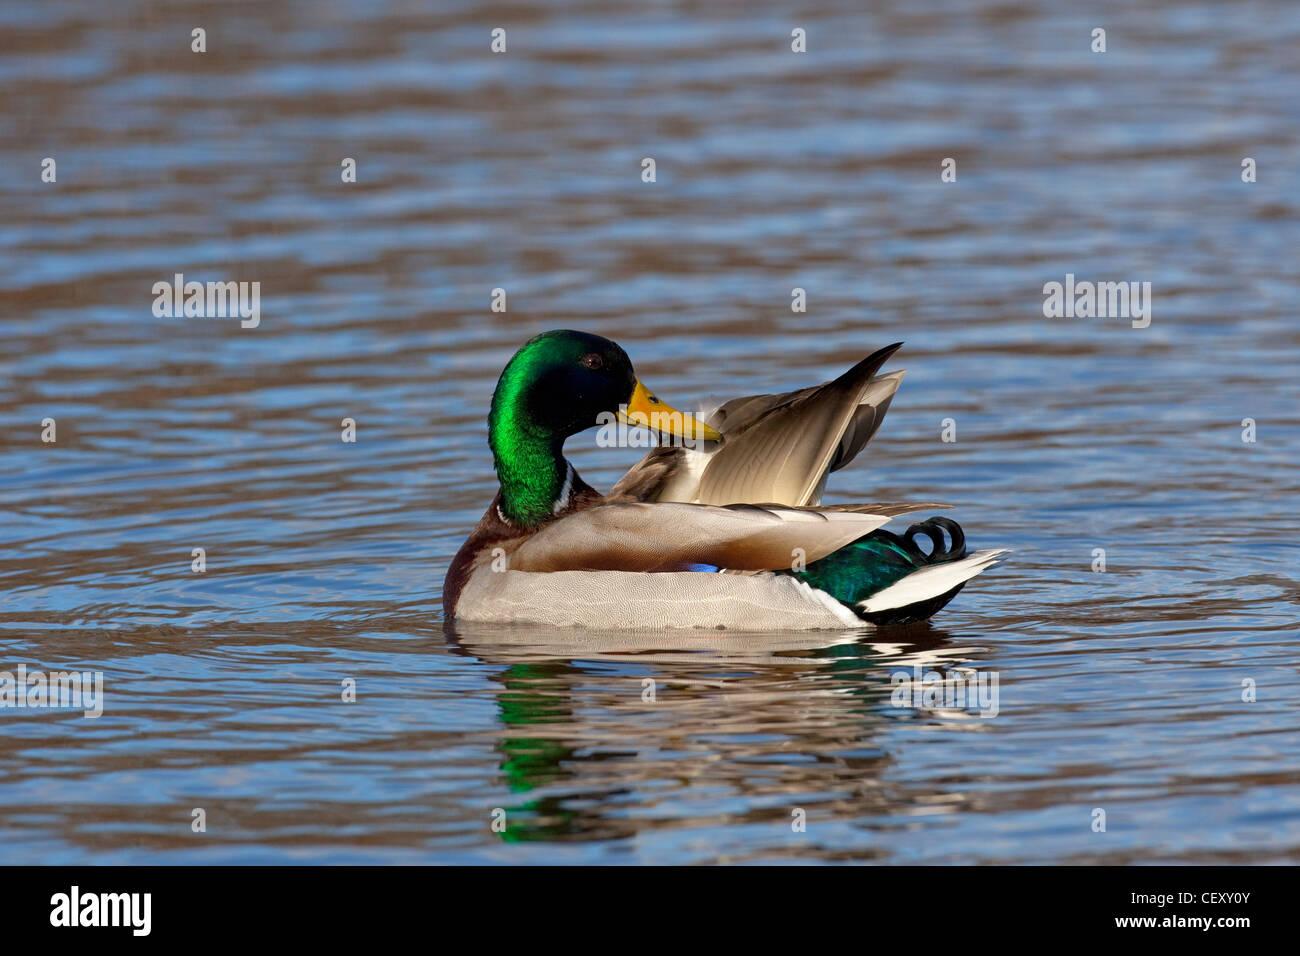 Stockente / Stockente (Anas Platyrhynchos) Drake putzen Federn auf See Stockfoto